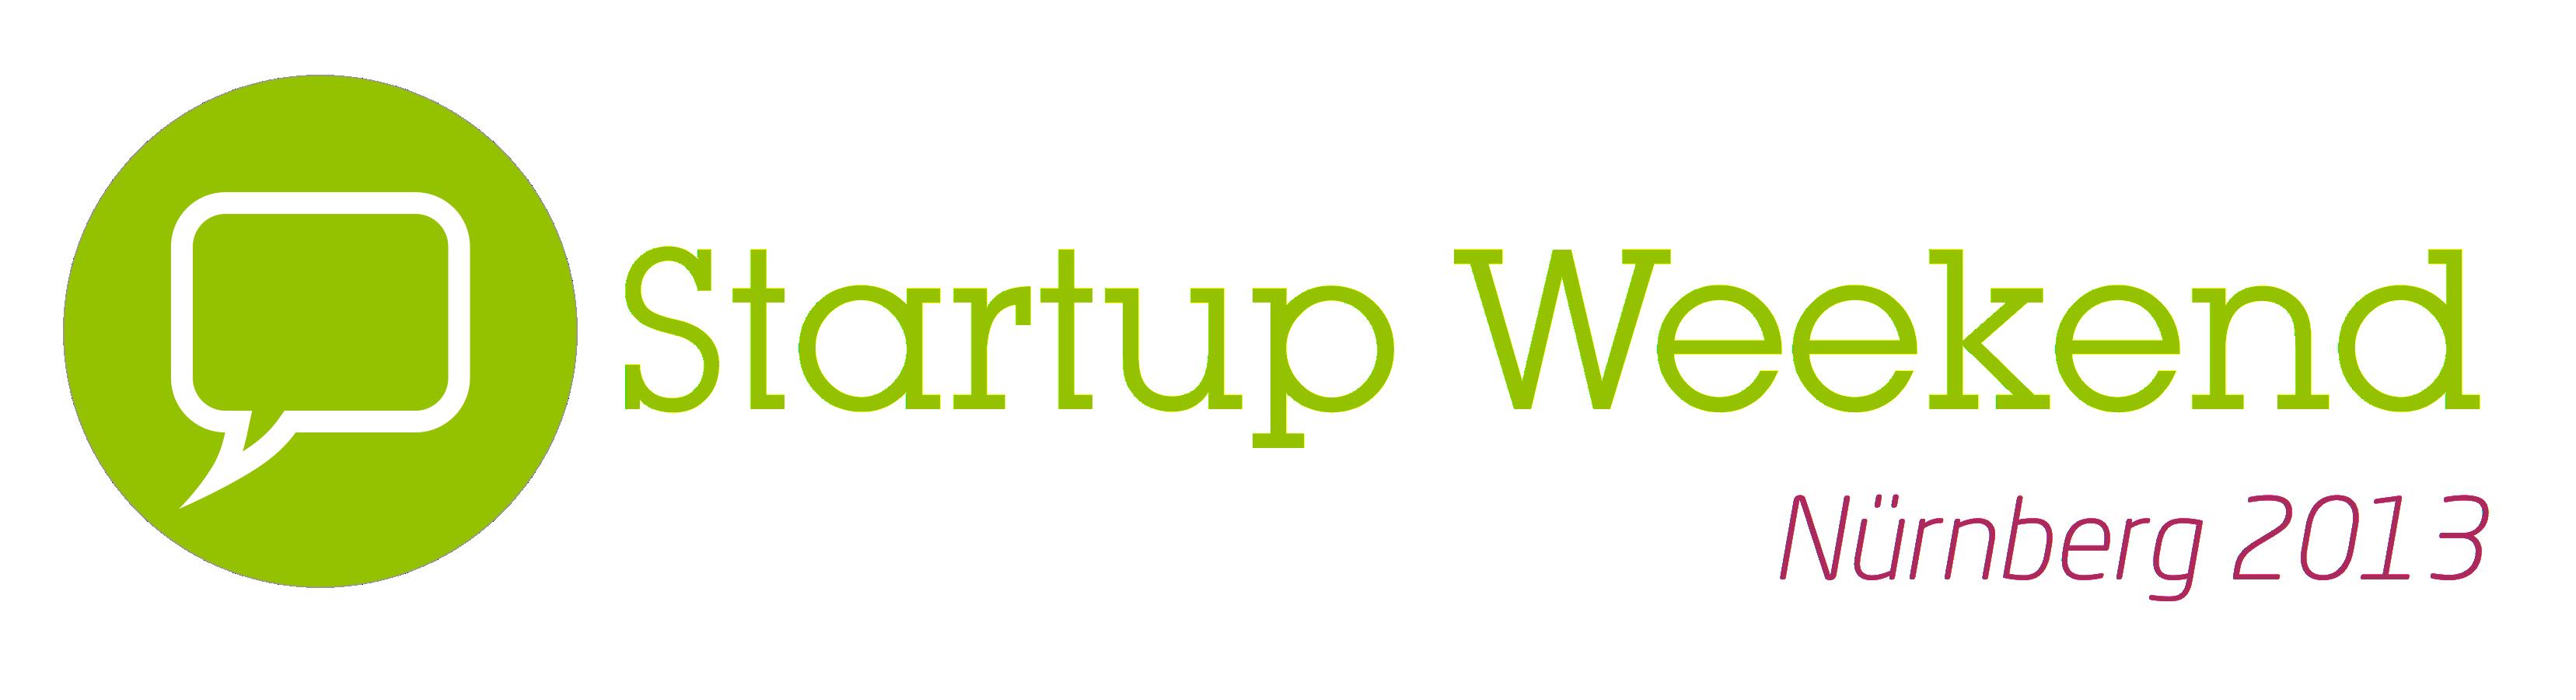 Veranstaltungstipp: Startup Weekend Nürnberg 2013